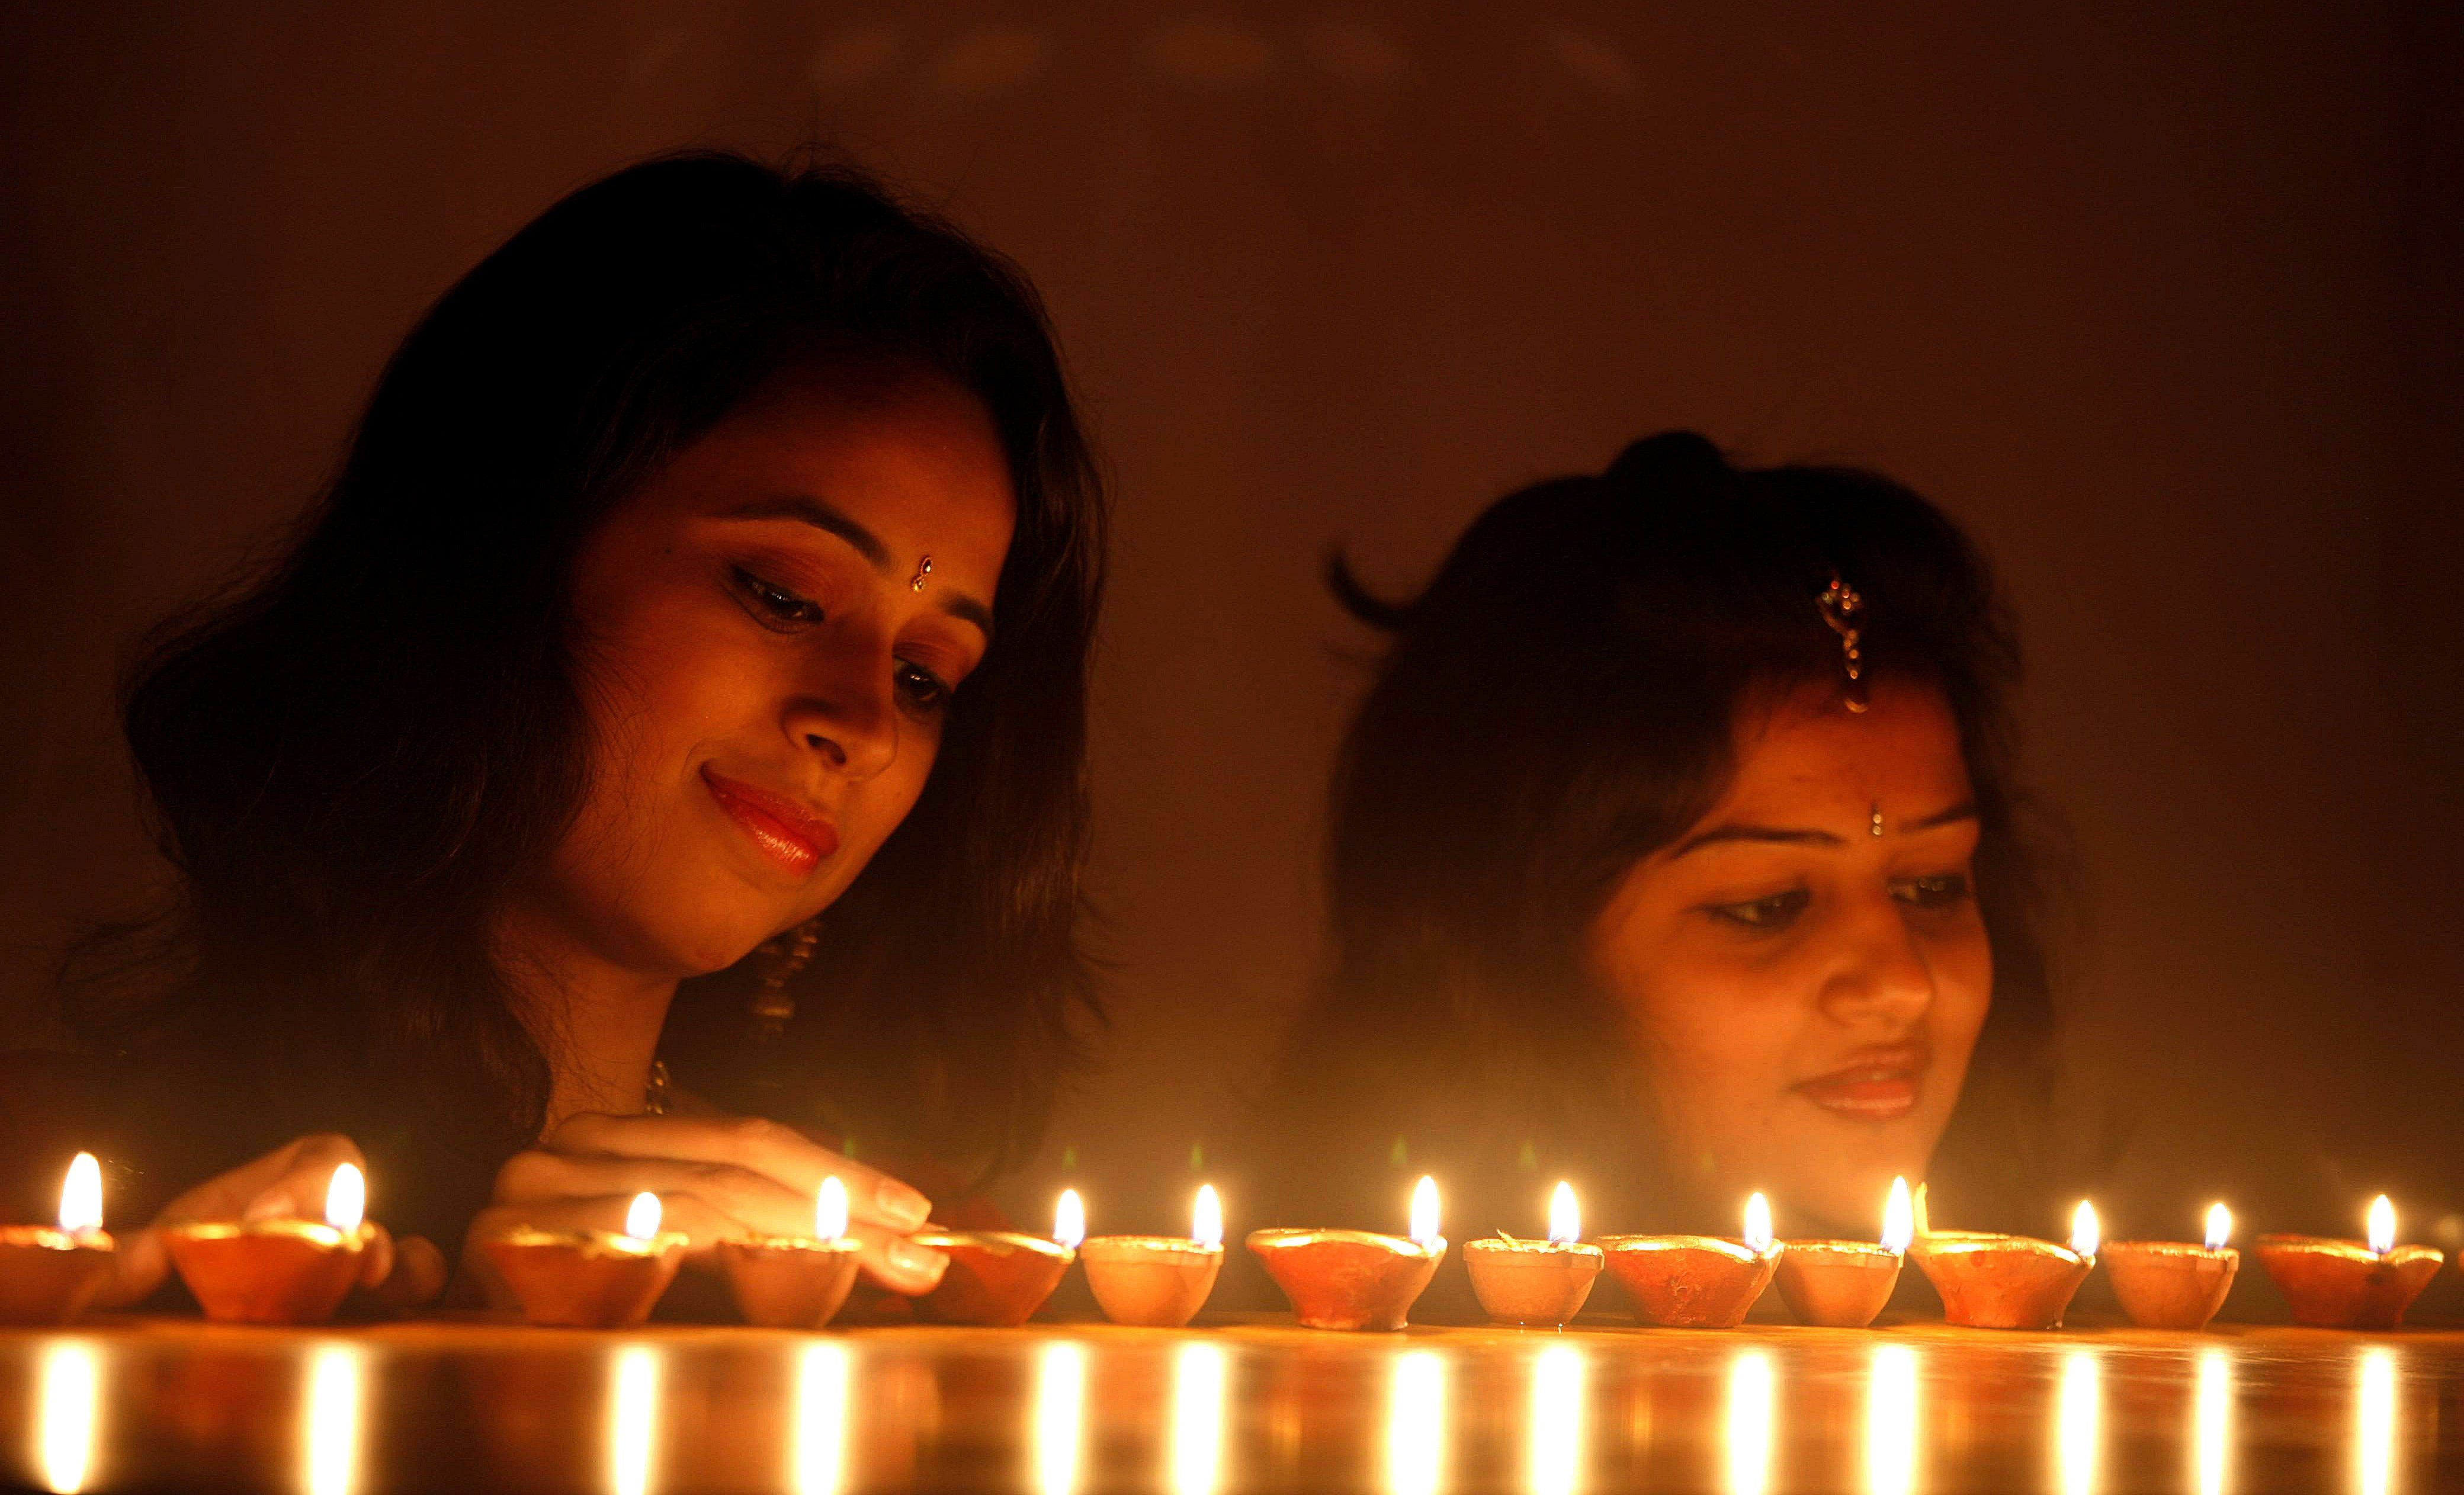 India Customs Festival - Nov 2012